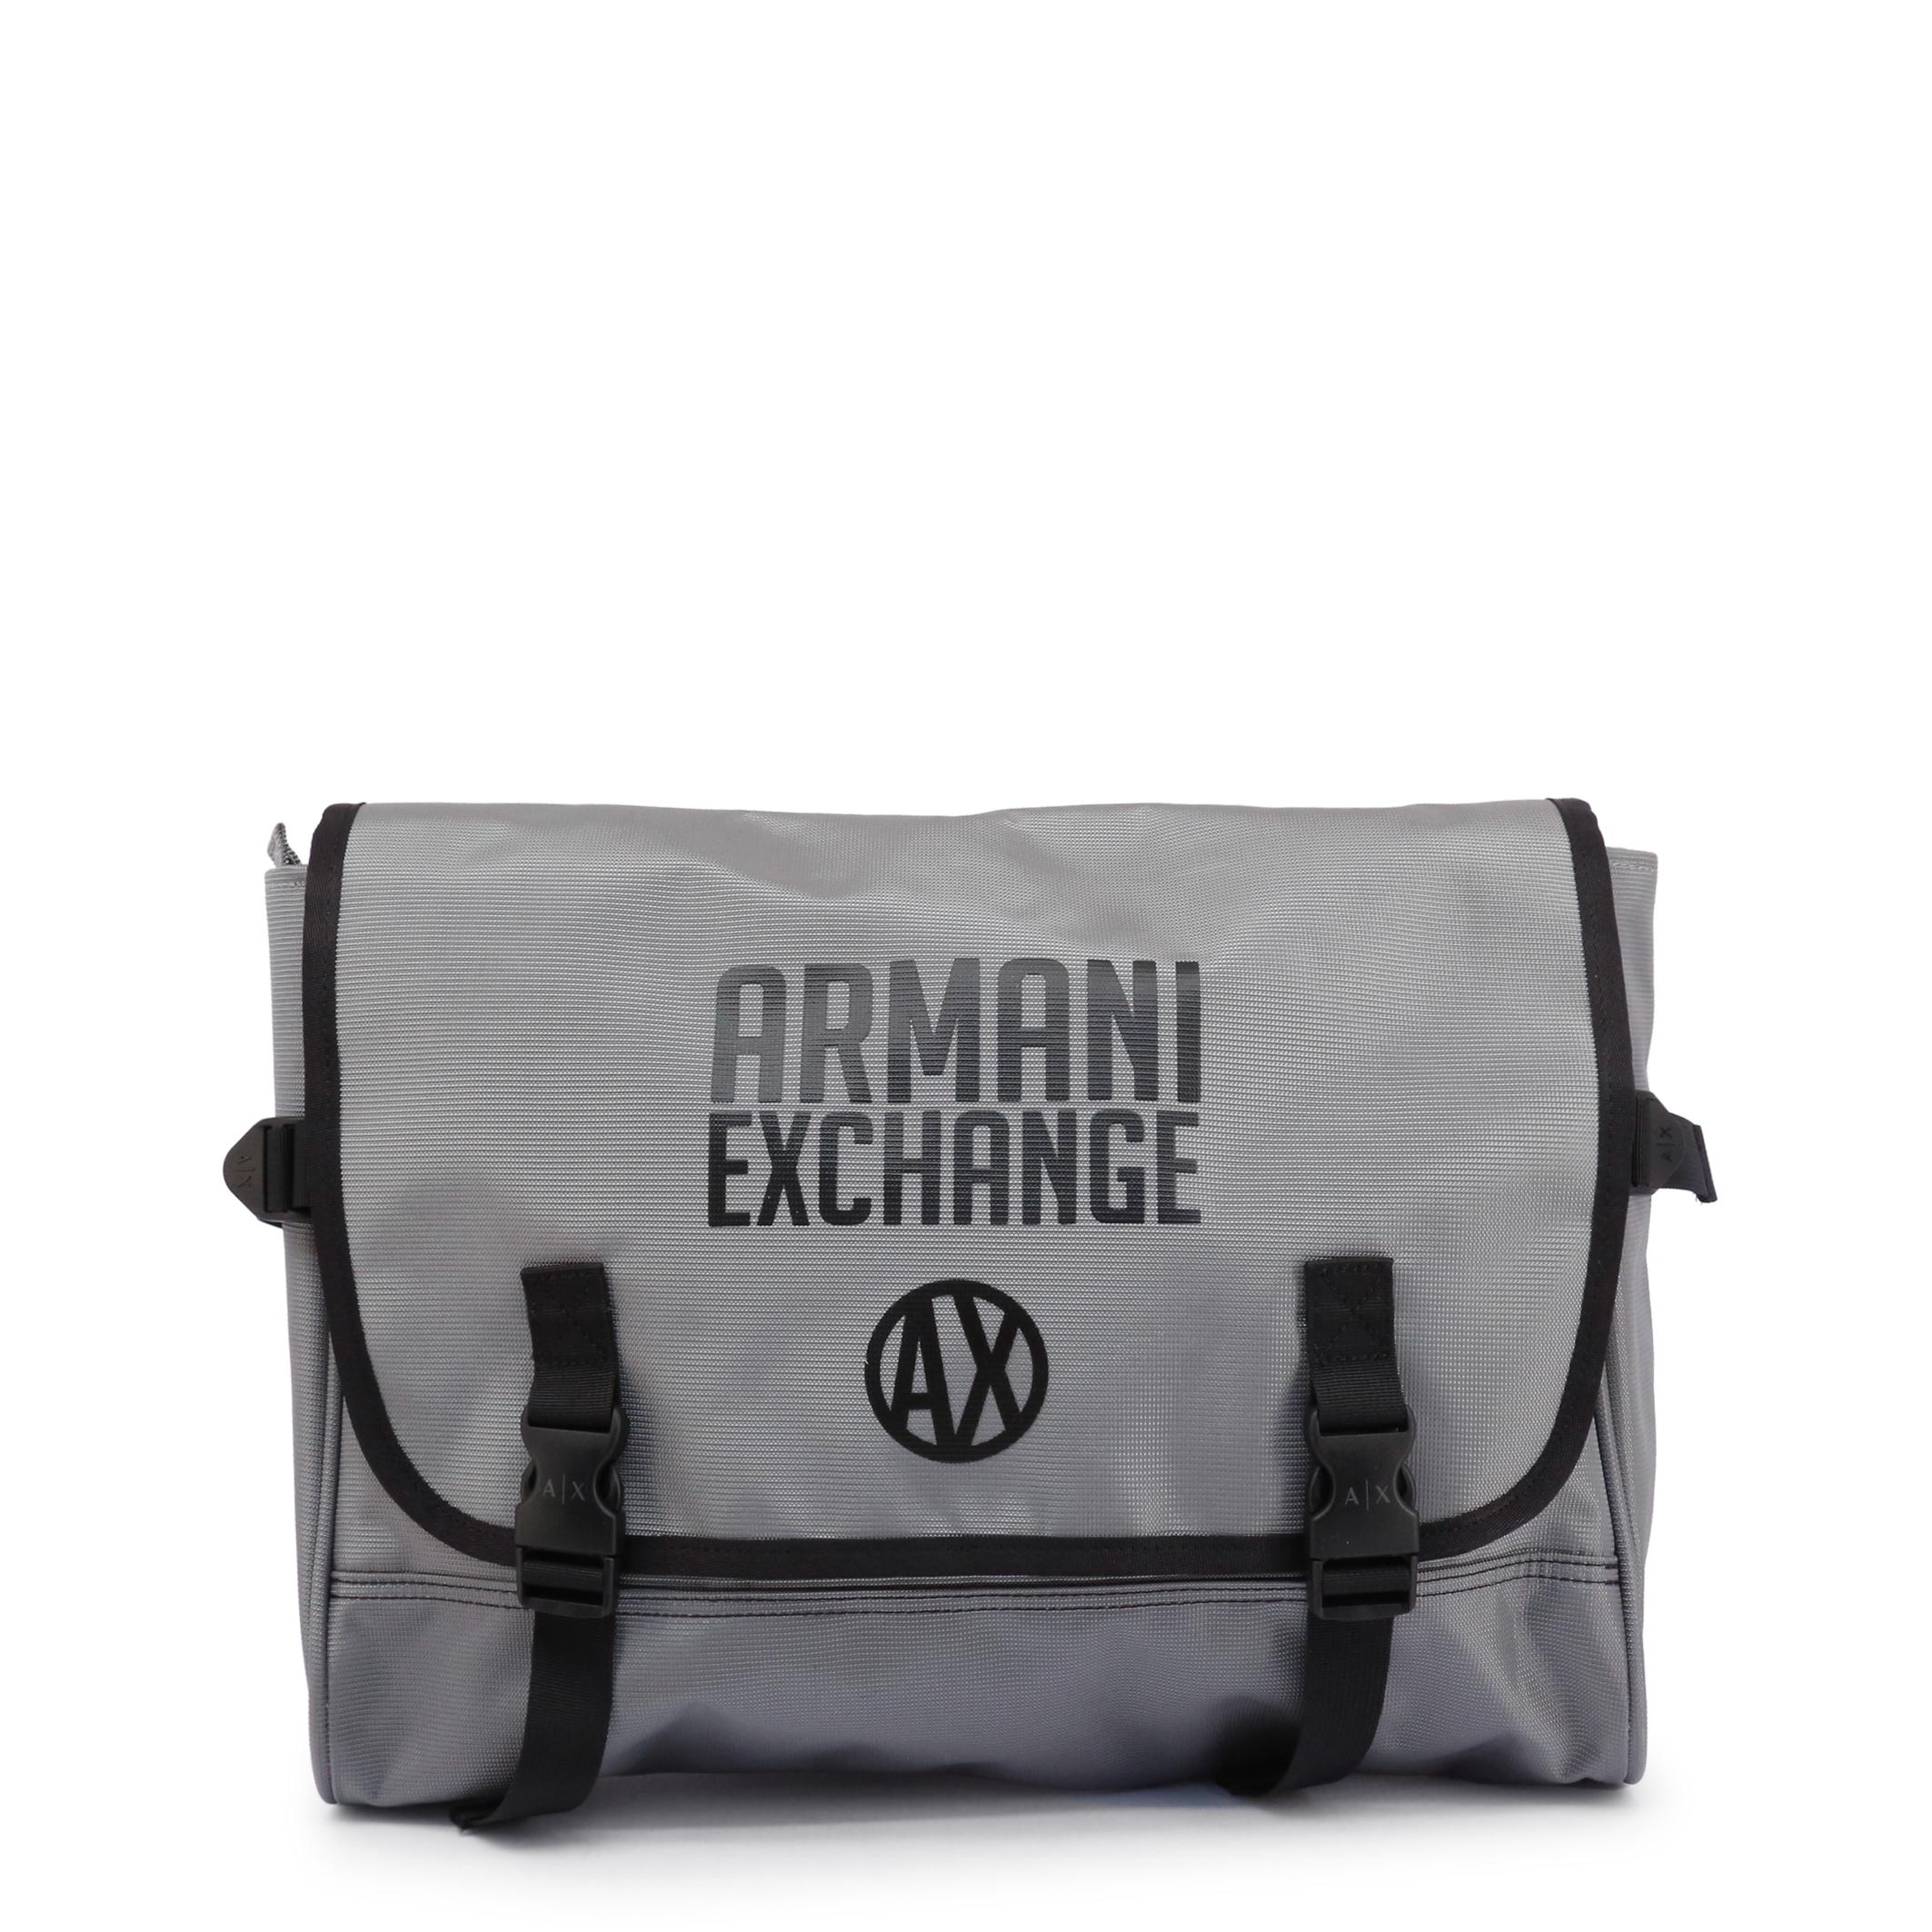 Armani Exchange 952094 8P201